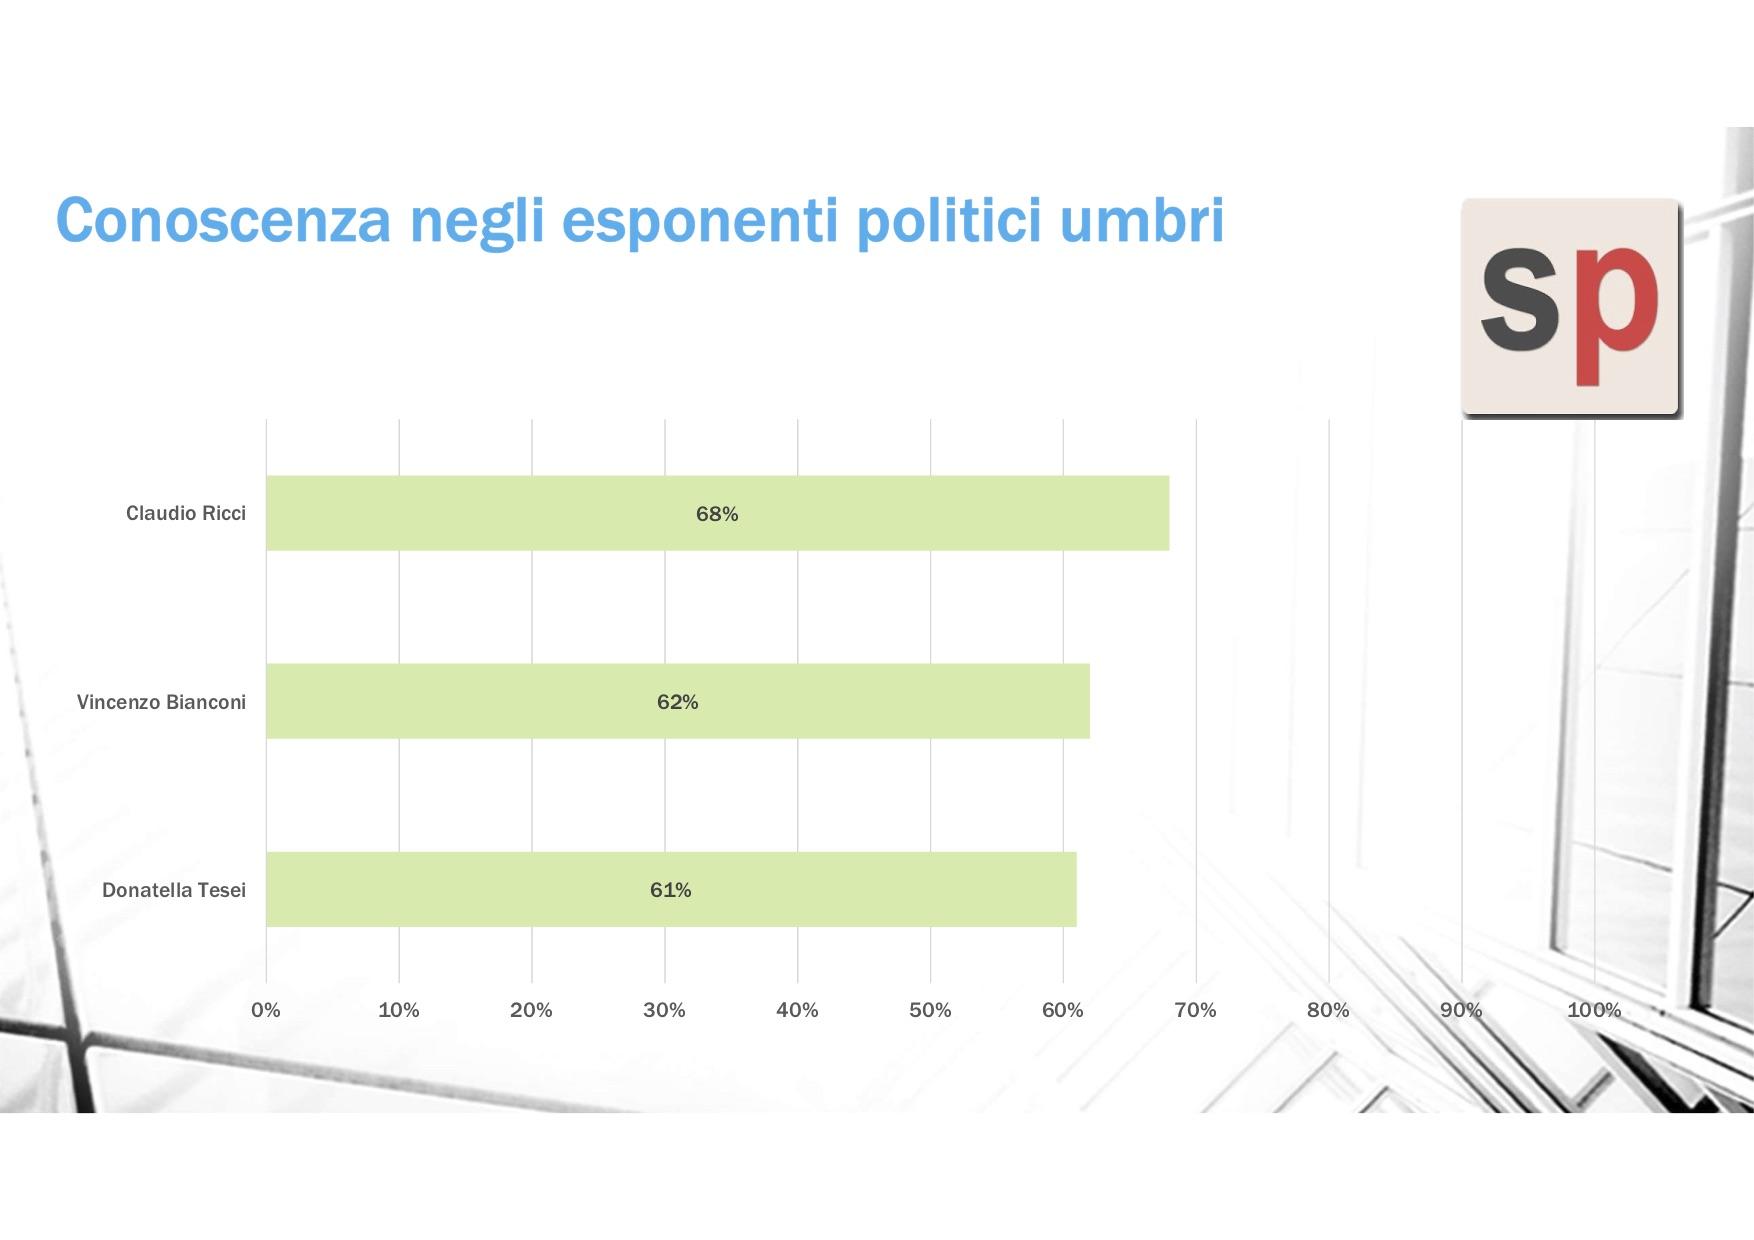 sondaggi politici winpoll, ricci